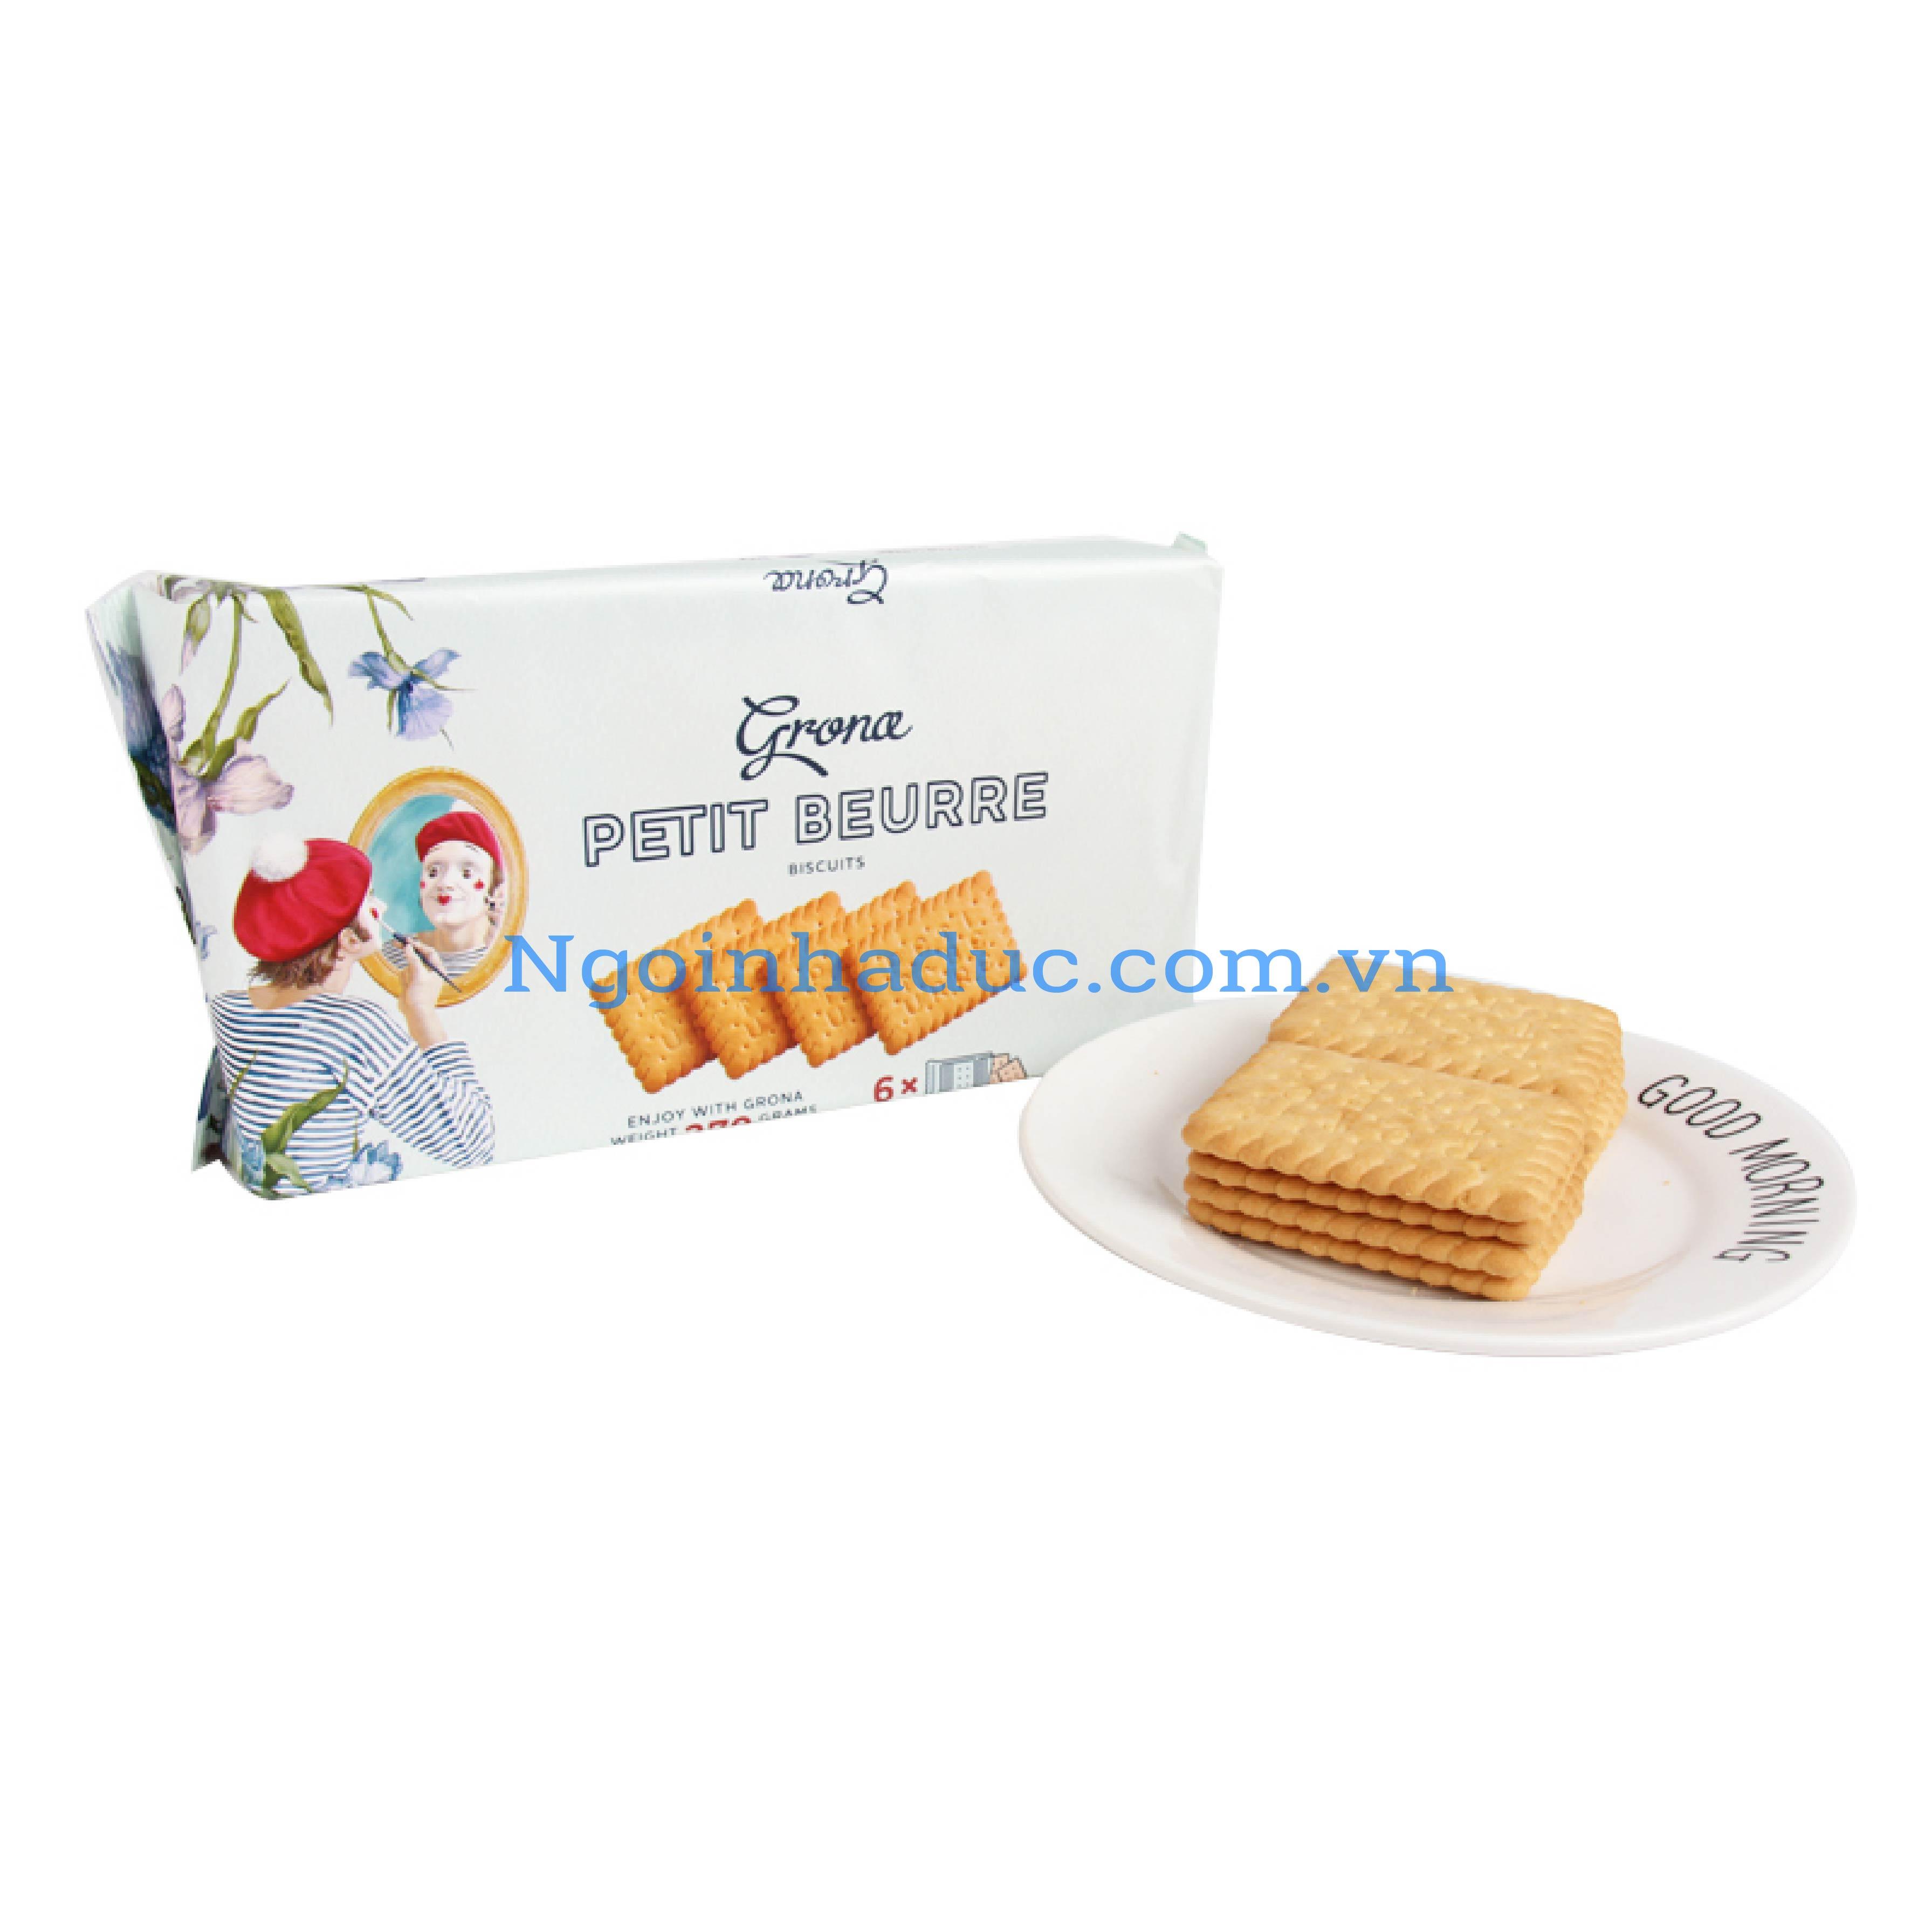 Bánh quy Grona Petit Beurre 279g (Nga)